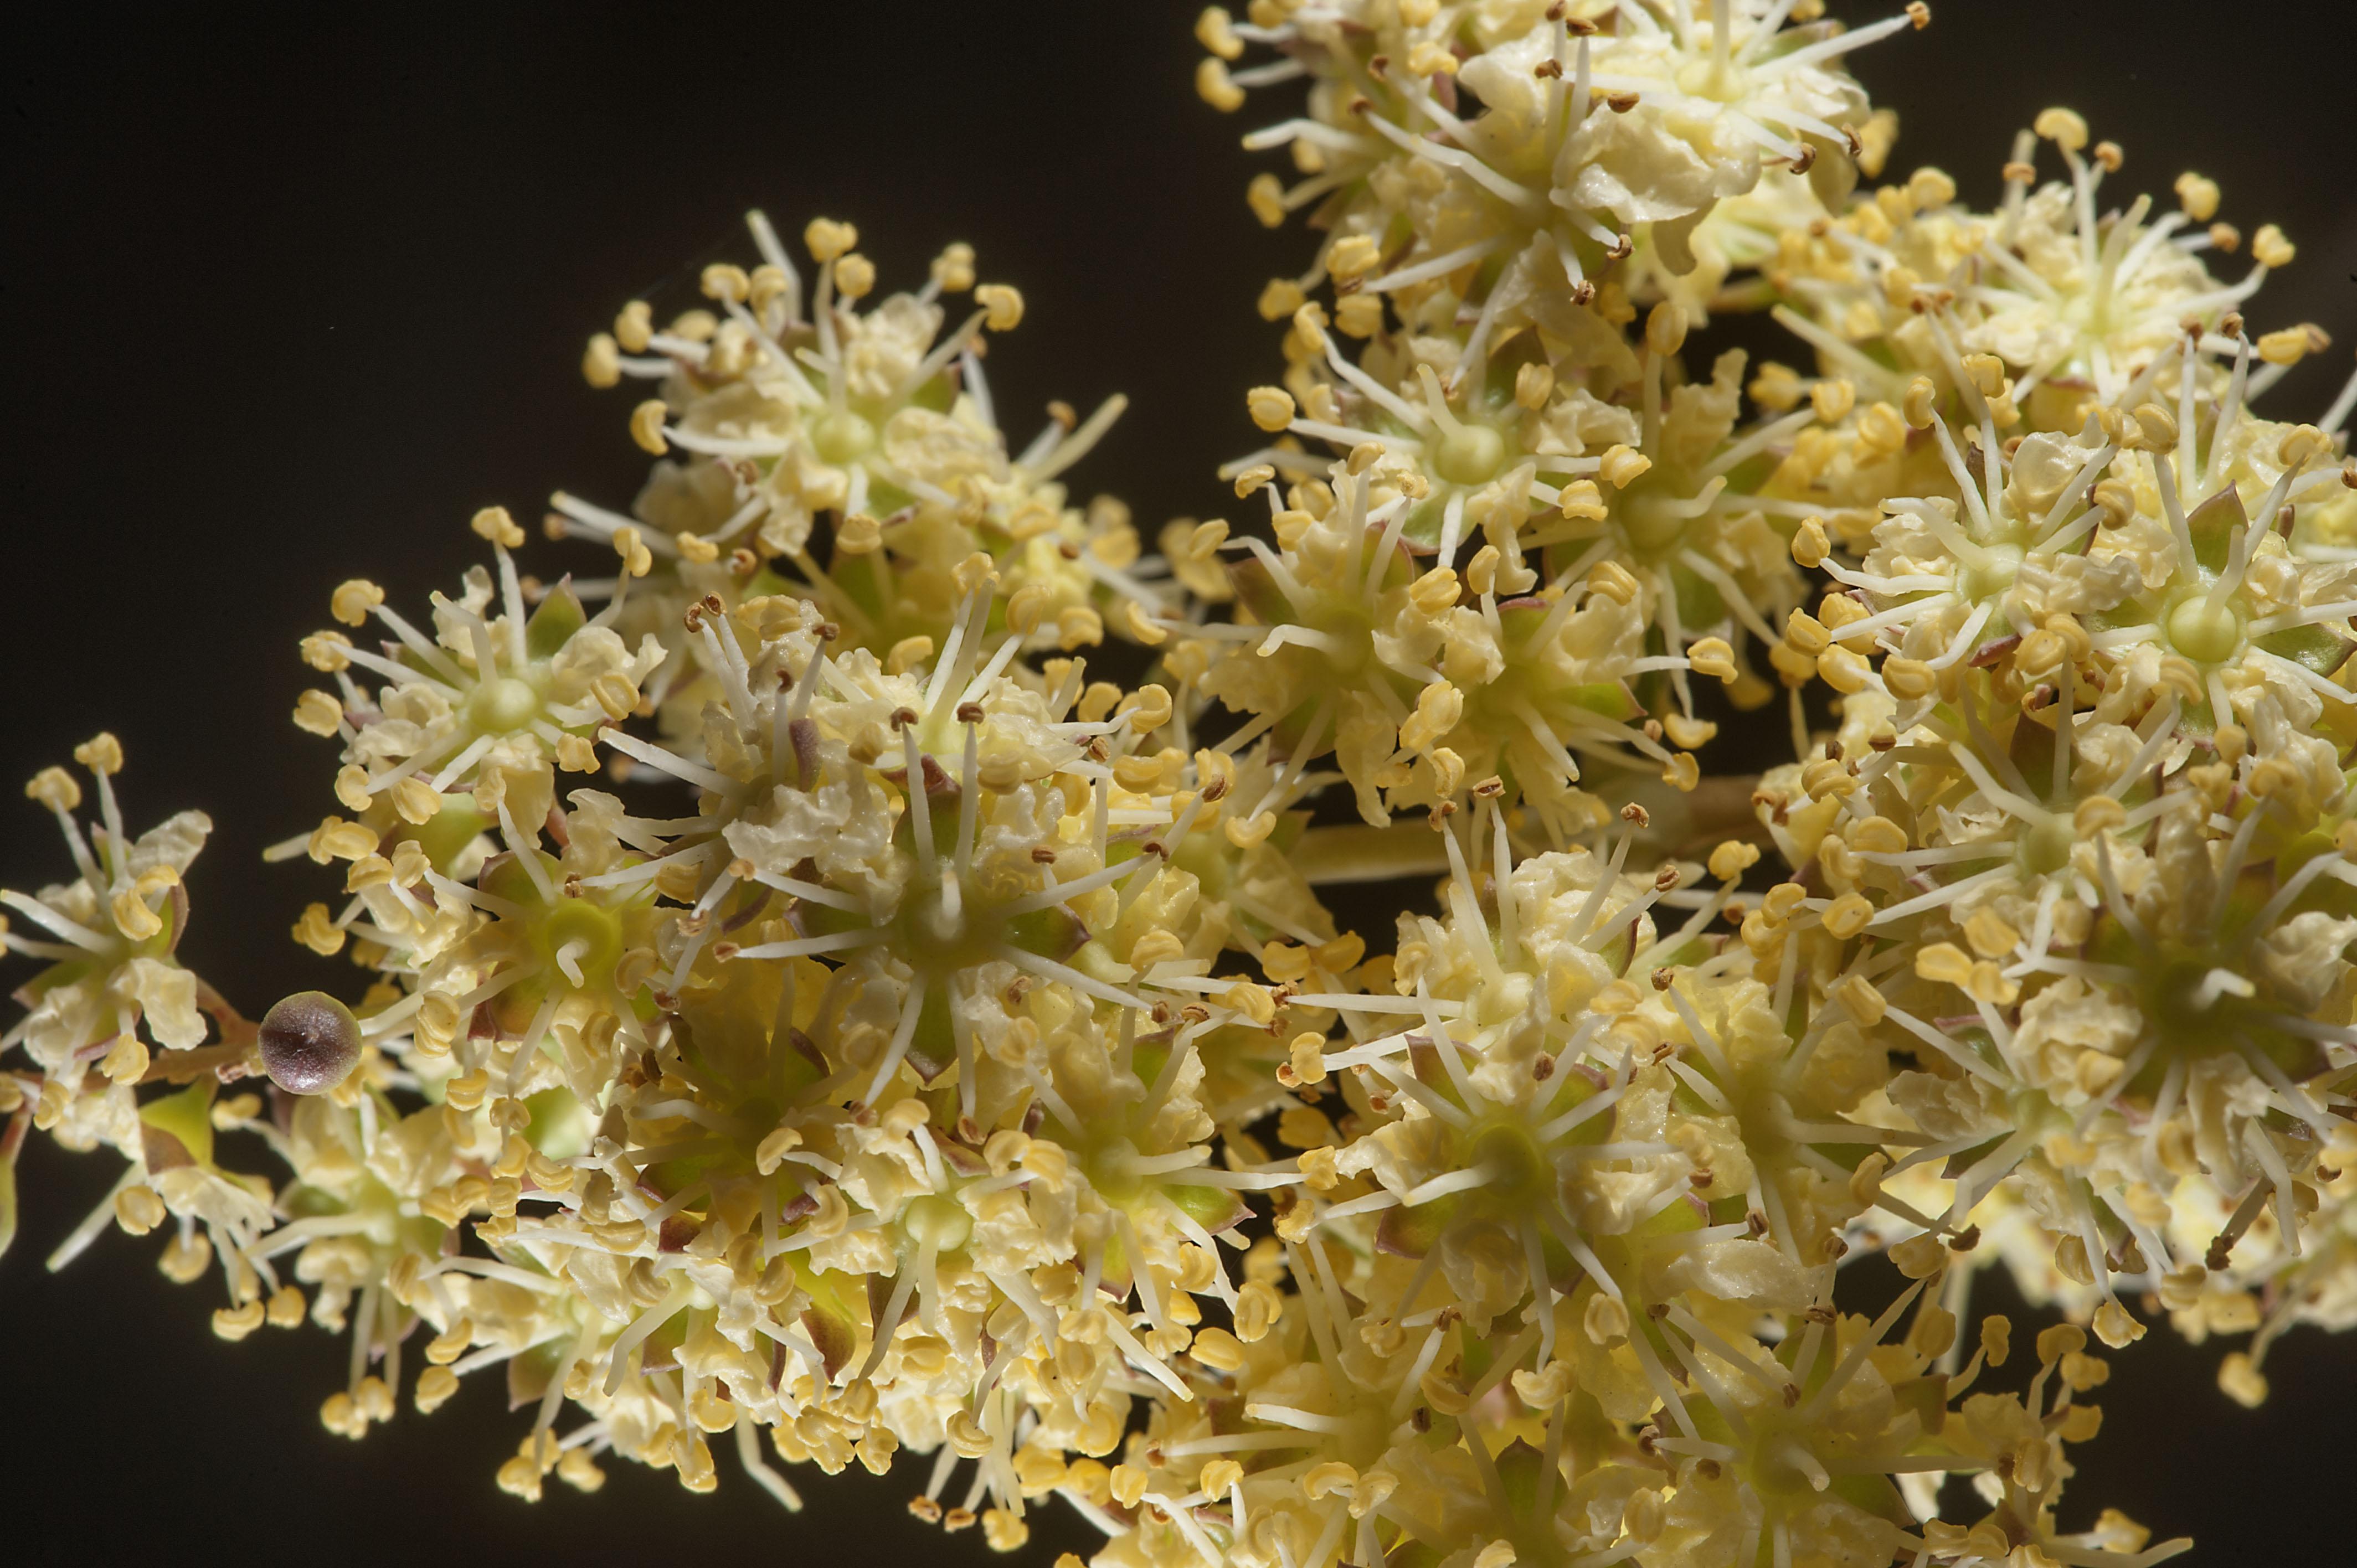 Lawsonia Inermis Flora Of Qatar